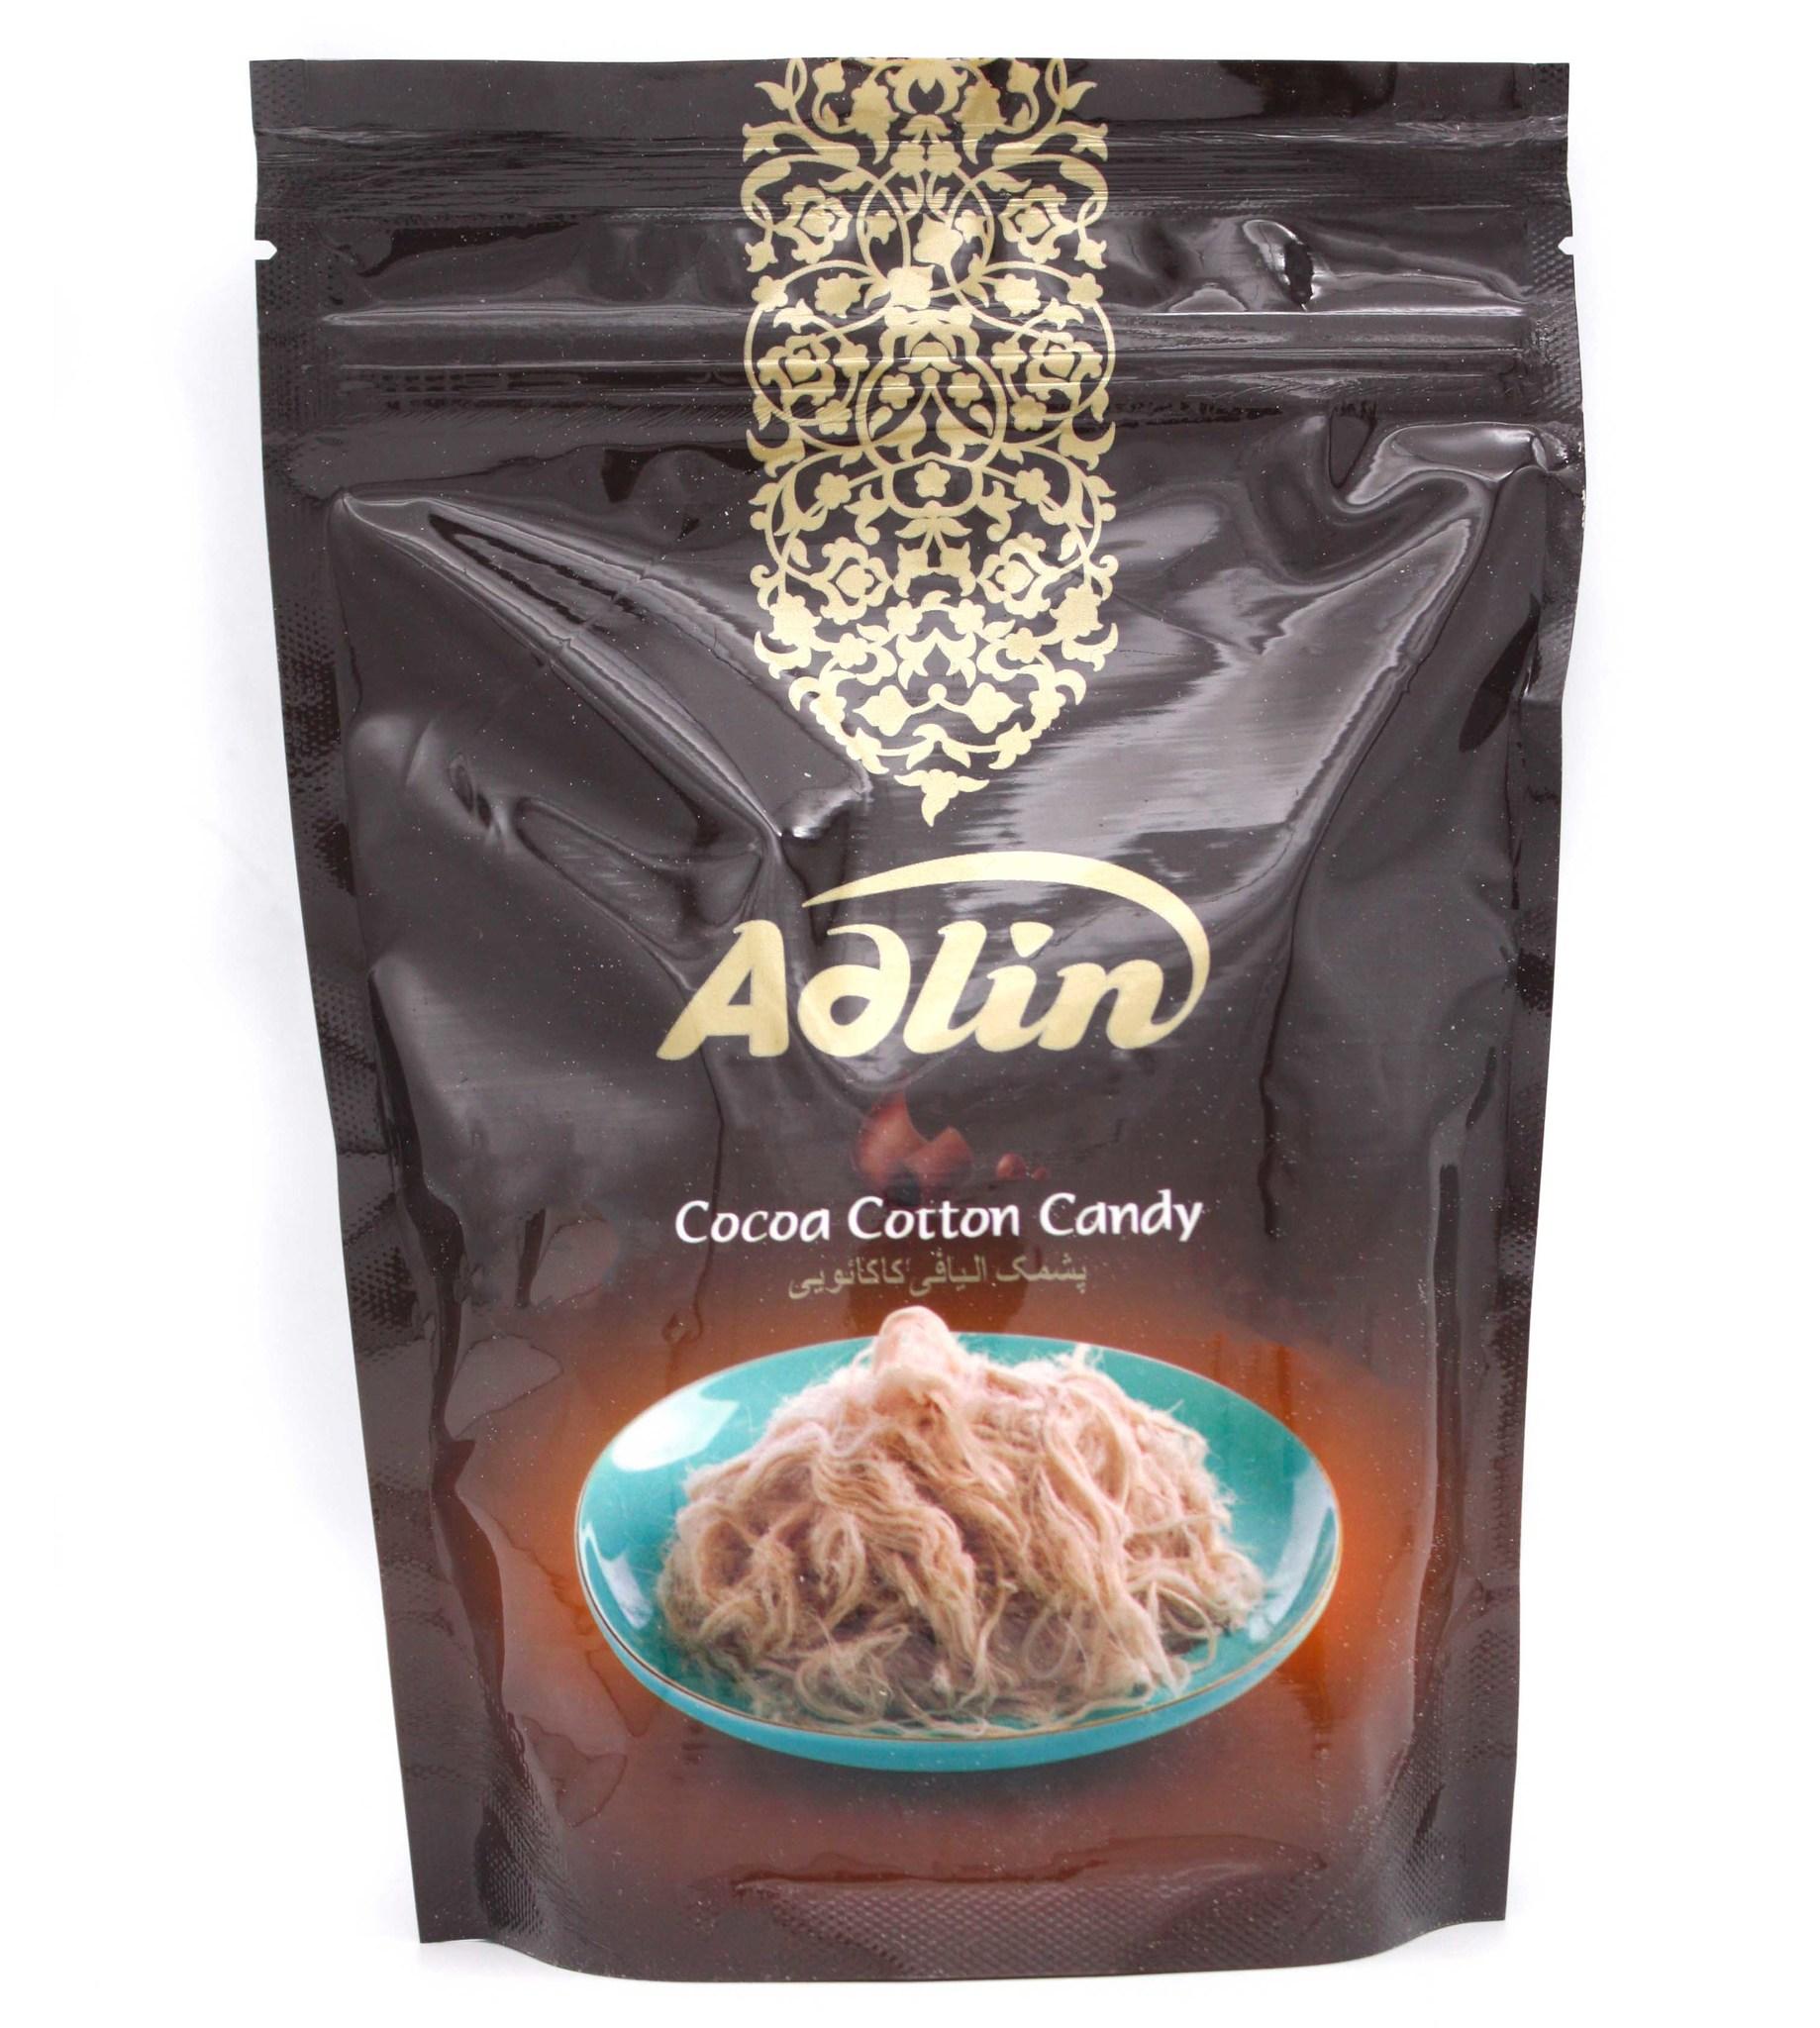 Adlin Пишмание со вкусом какао, Adlin, 150 г import_files_7a_7a7d6a25c3f111e9a9b3484d7ecee297_6b6365d6226211eaa9c6484d7ecee297.jpg